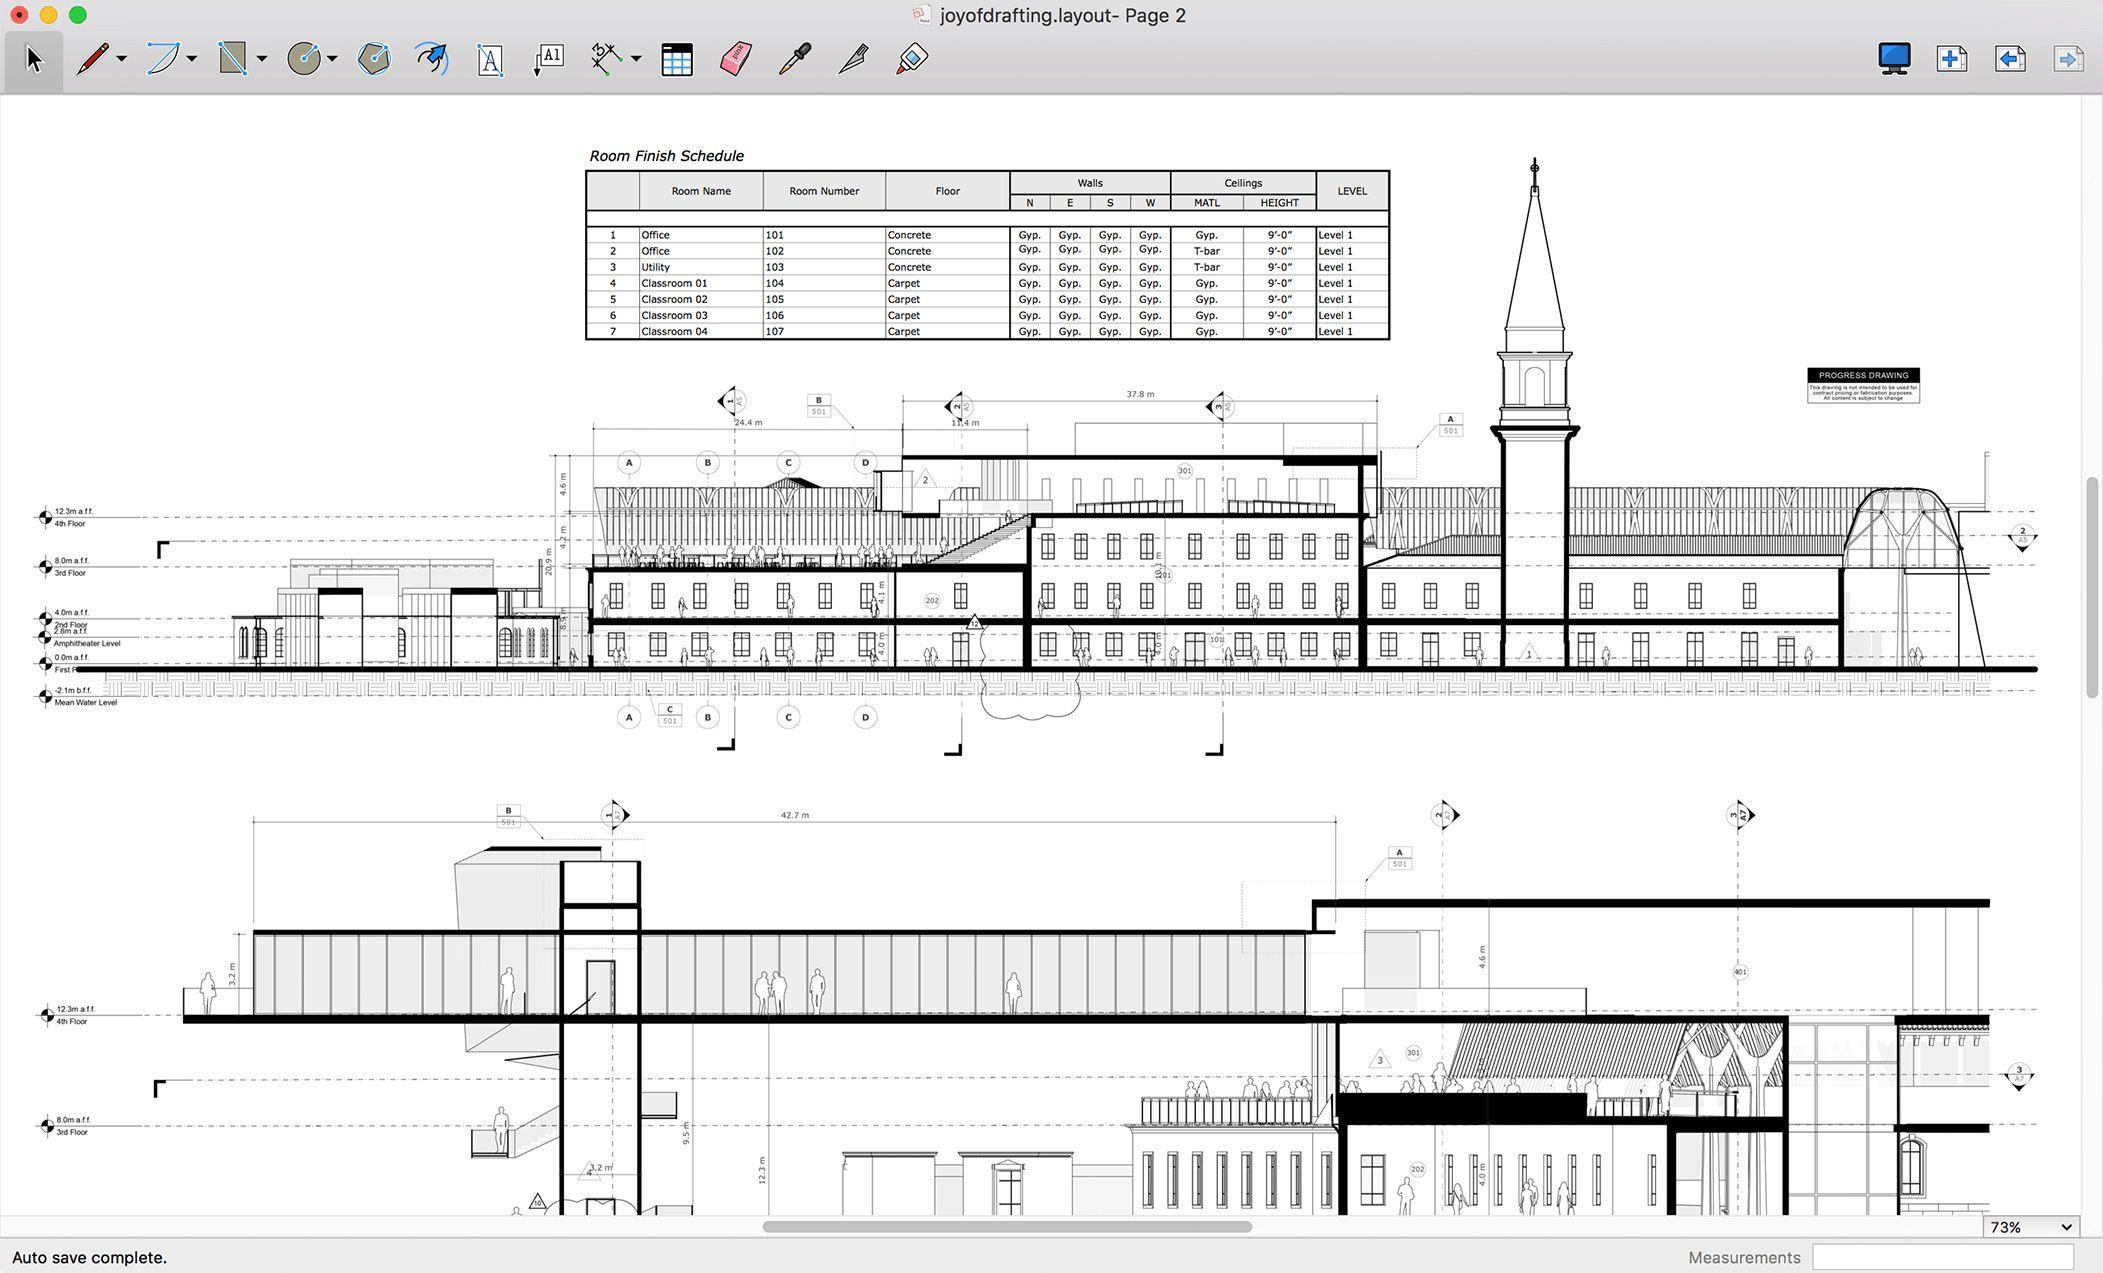 sketchup - layout tabelas